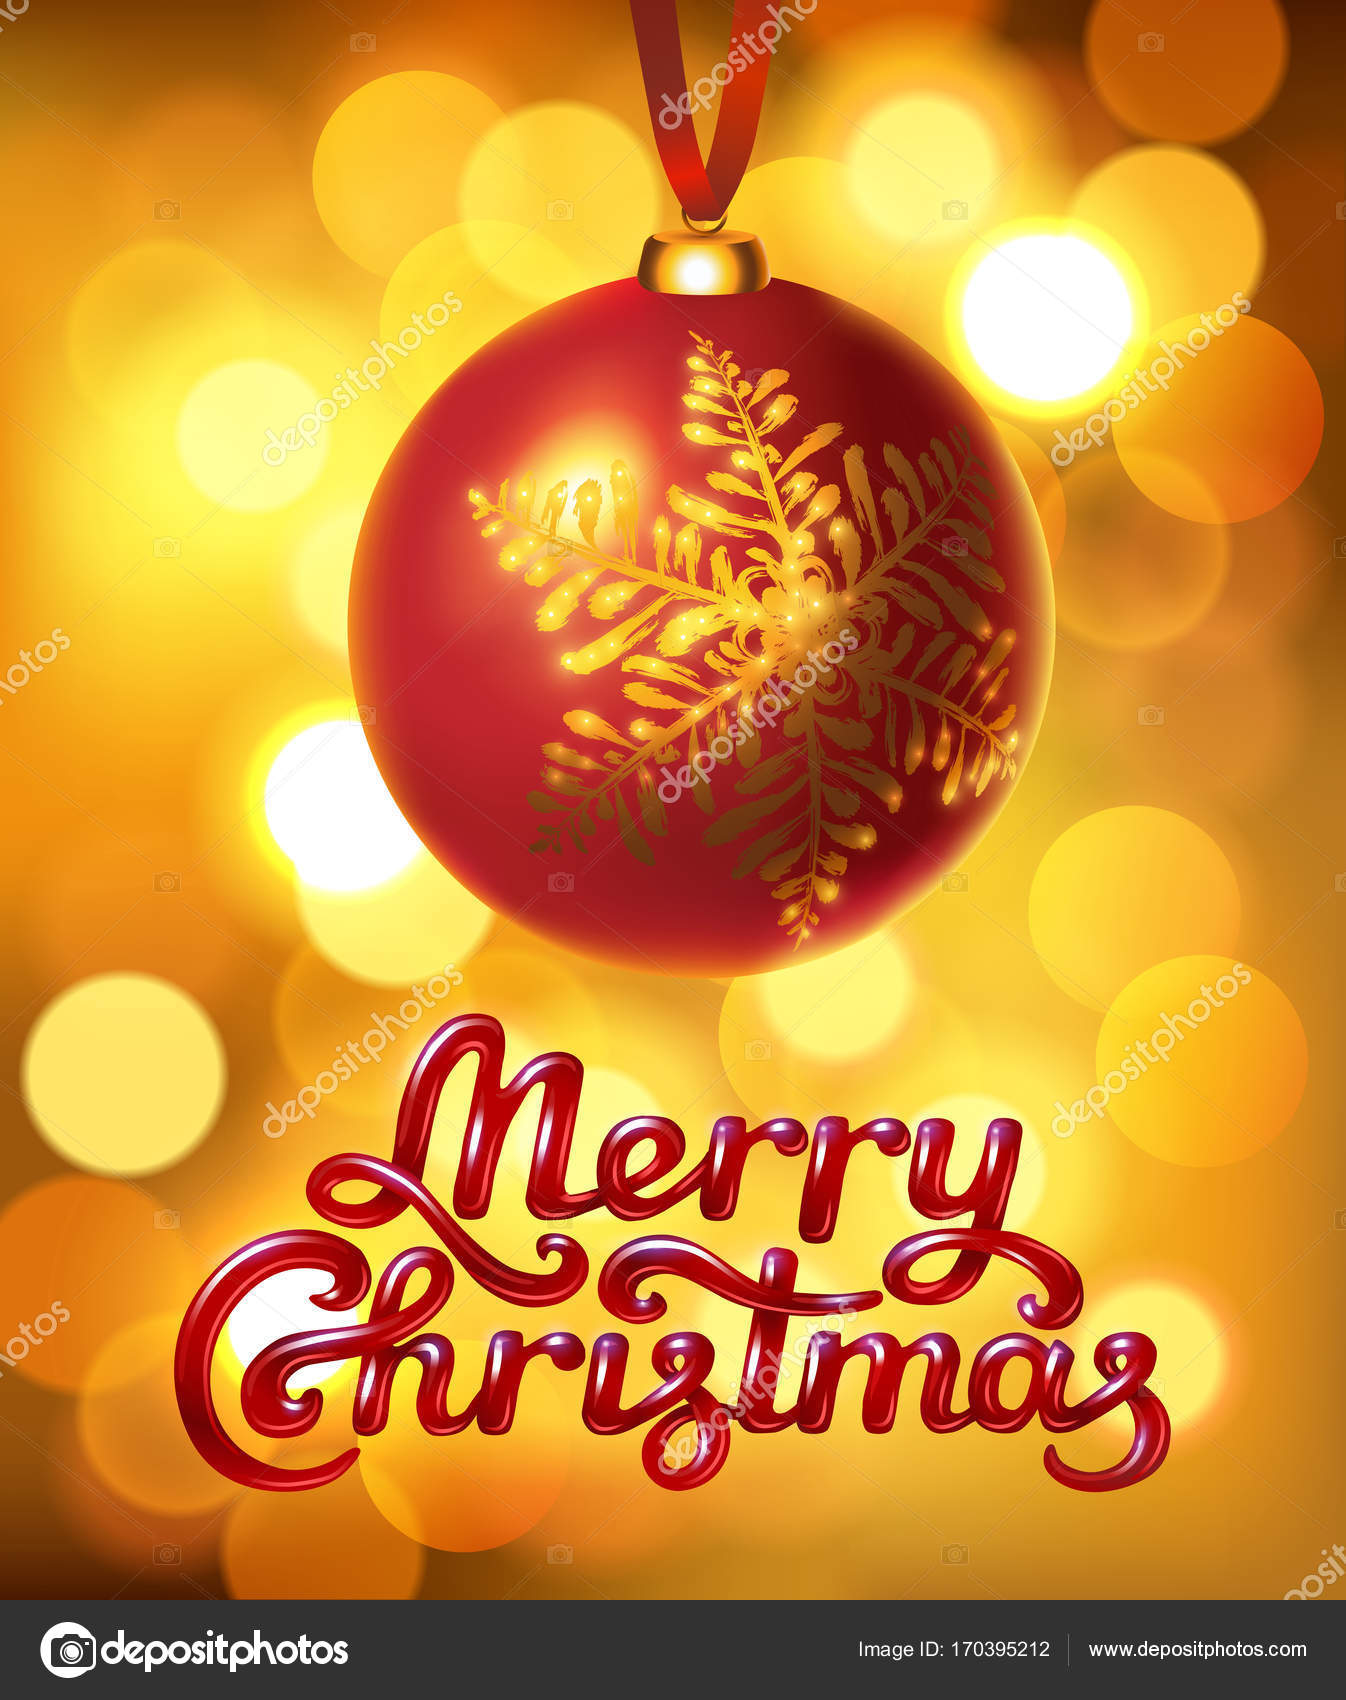 Schriftzug Frohe Weihnachten Beleuchtet.Frohe Weihnachten Hand Schriftzug Stockvektor